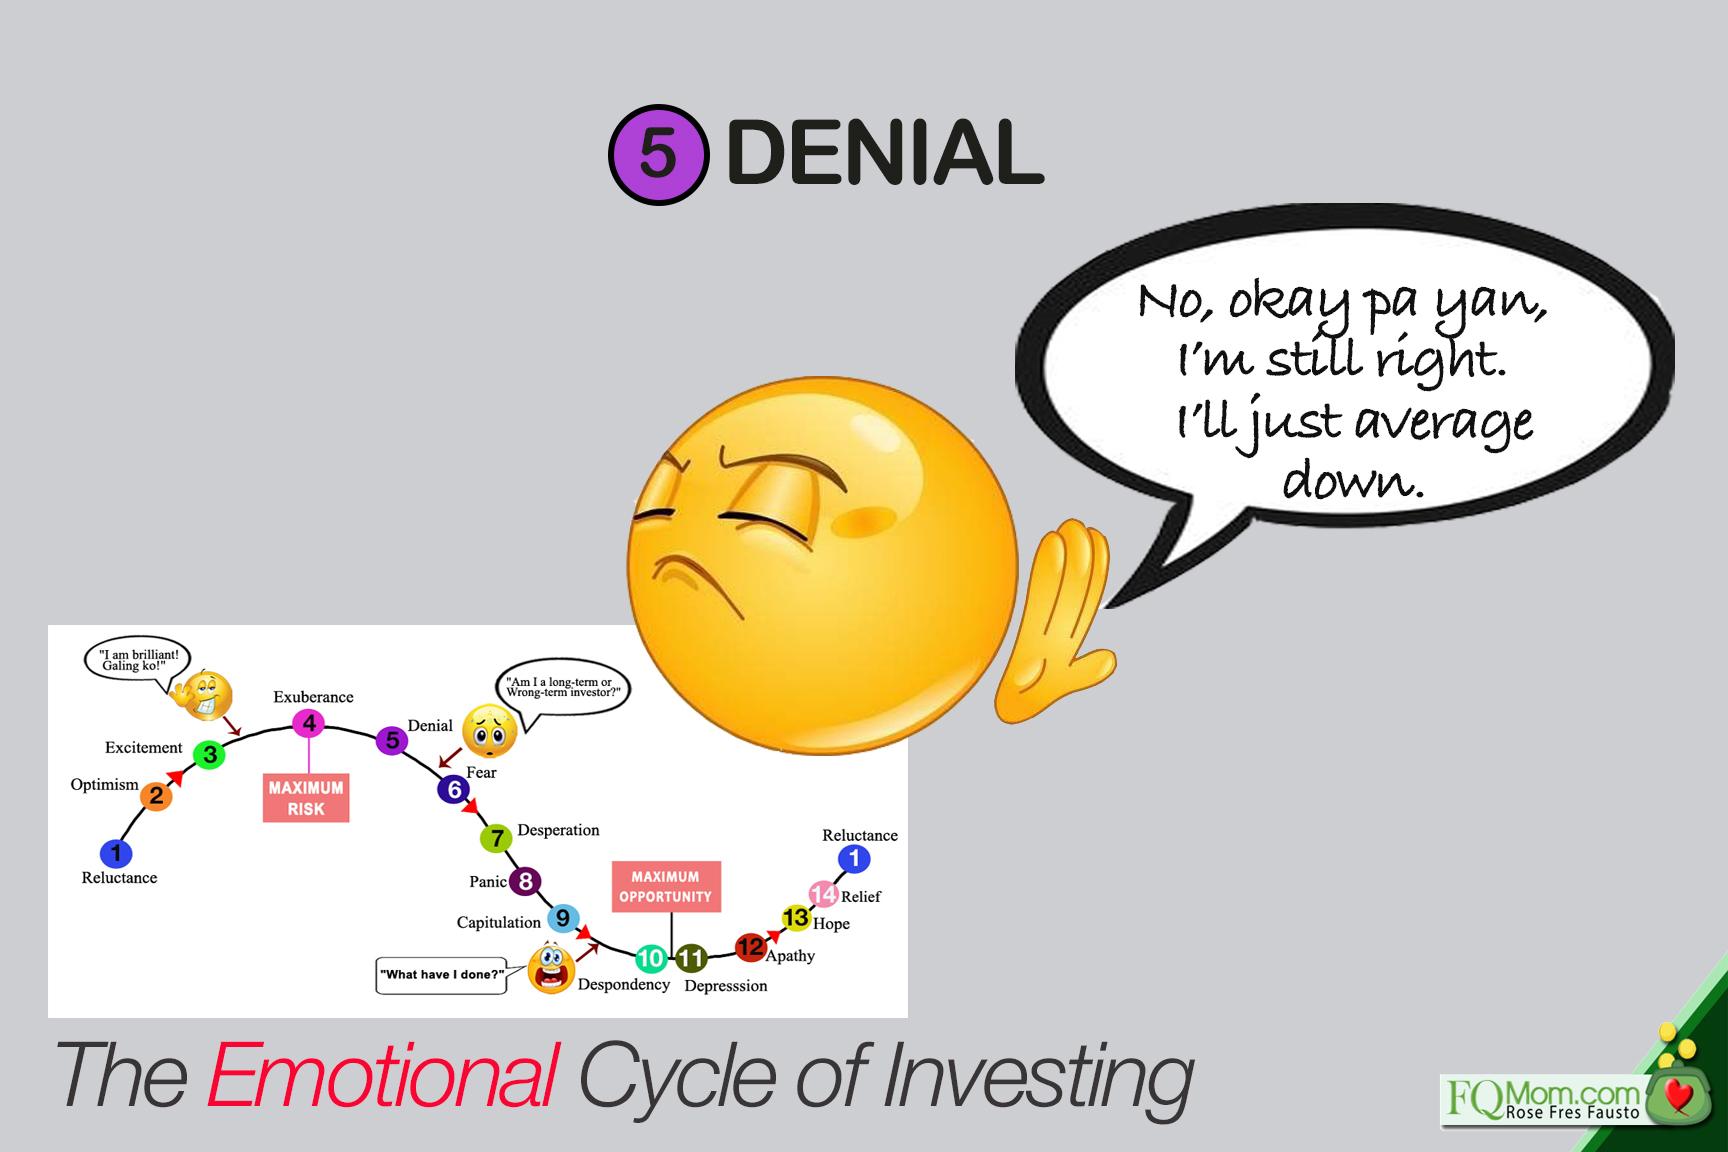 5-denial